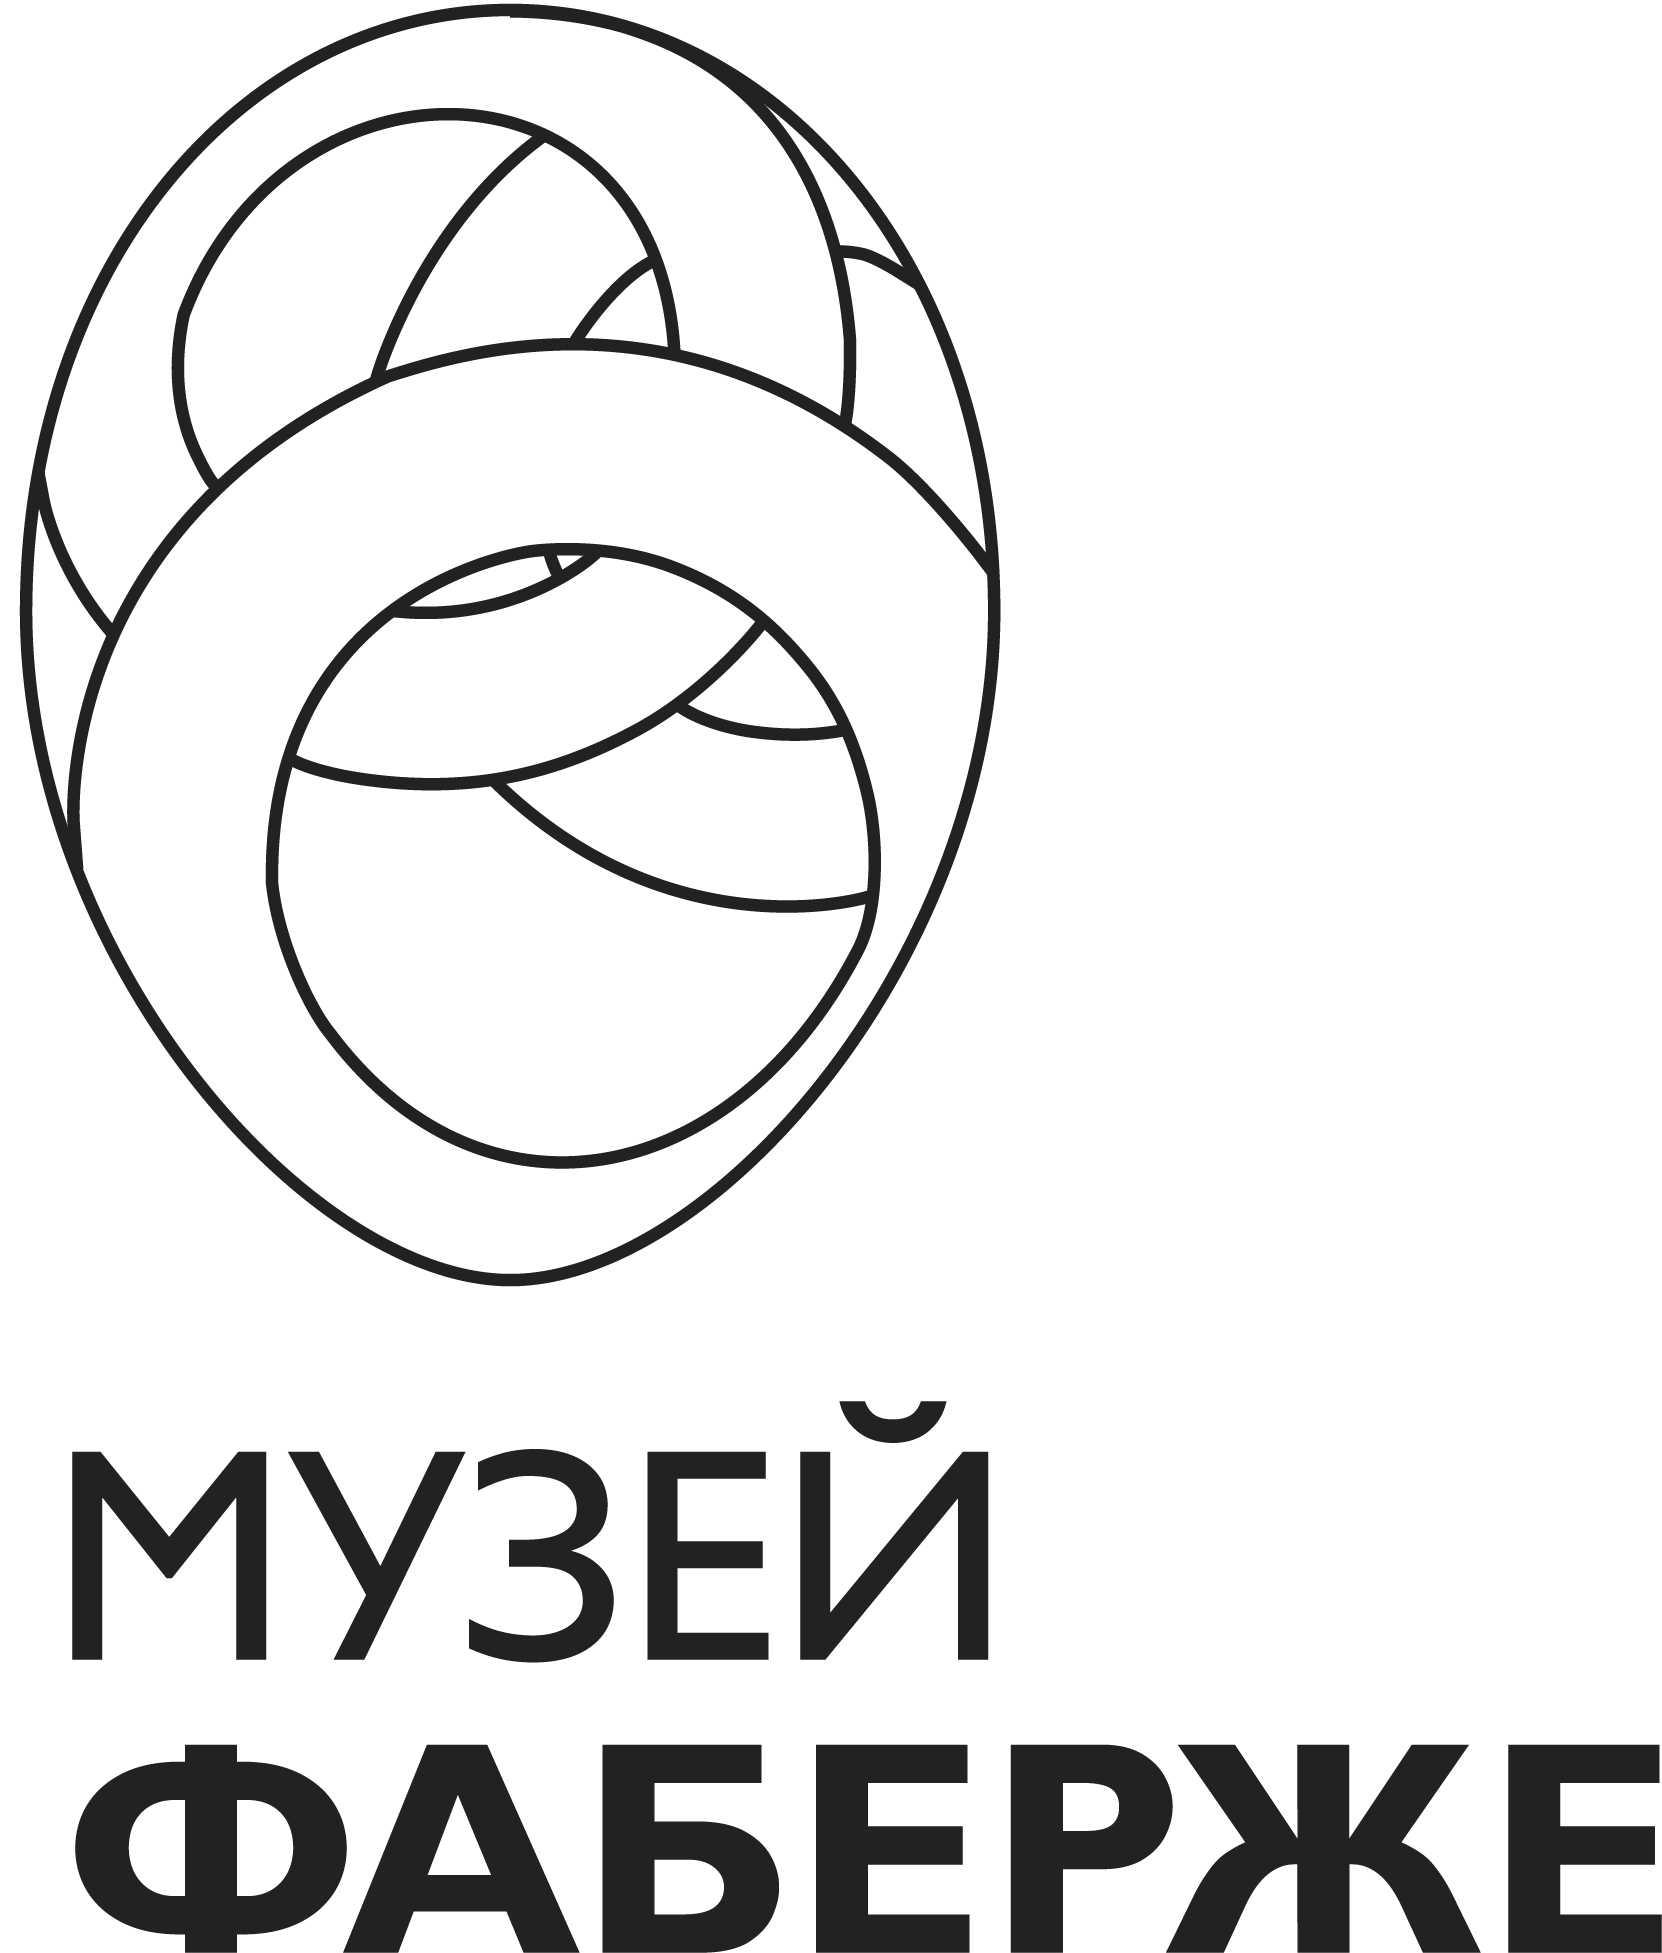 Михаил Овчинников/Wikimedia CC BY-SA 4.0 https://creativecommons.org/licenses/by-sa/4.0/deed.en